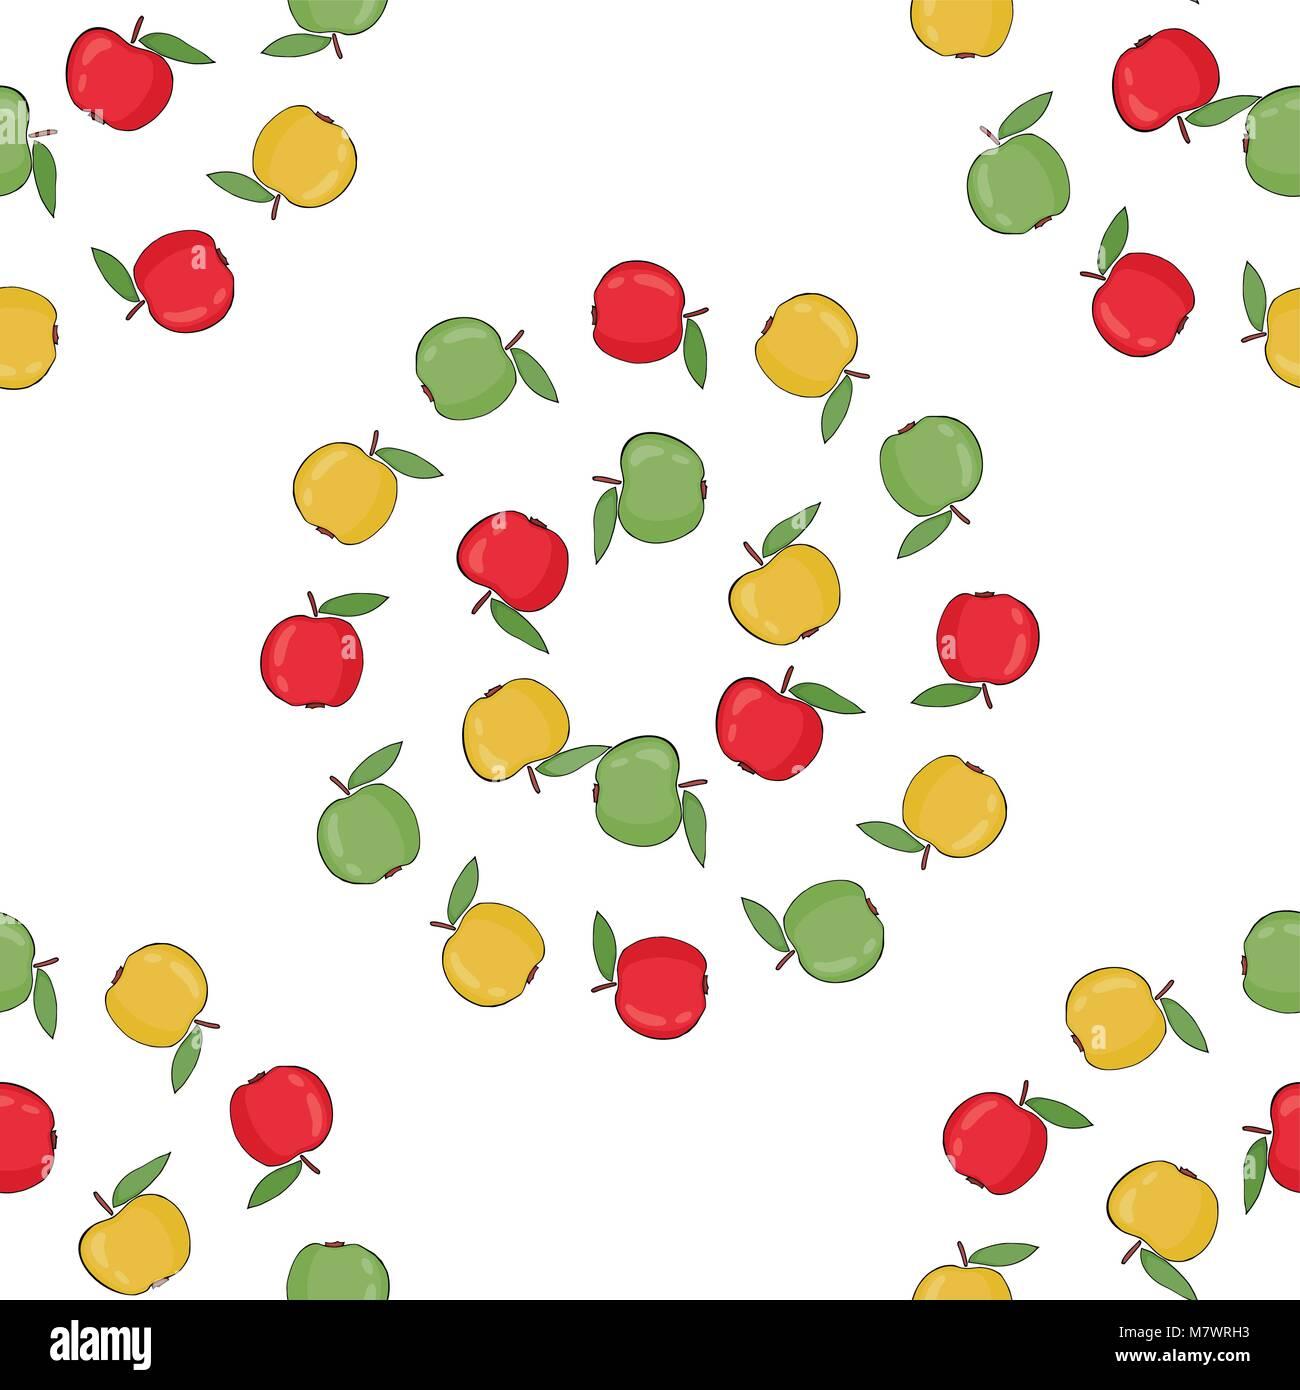 apples wallpaper stock photos & apples wallpaper stock images - alamy